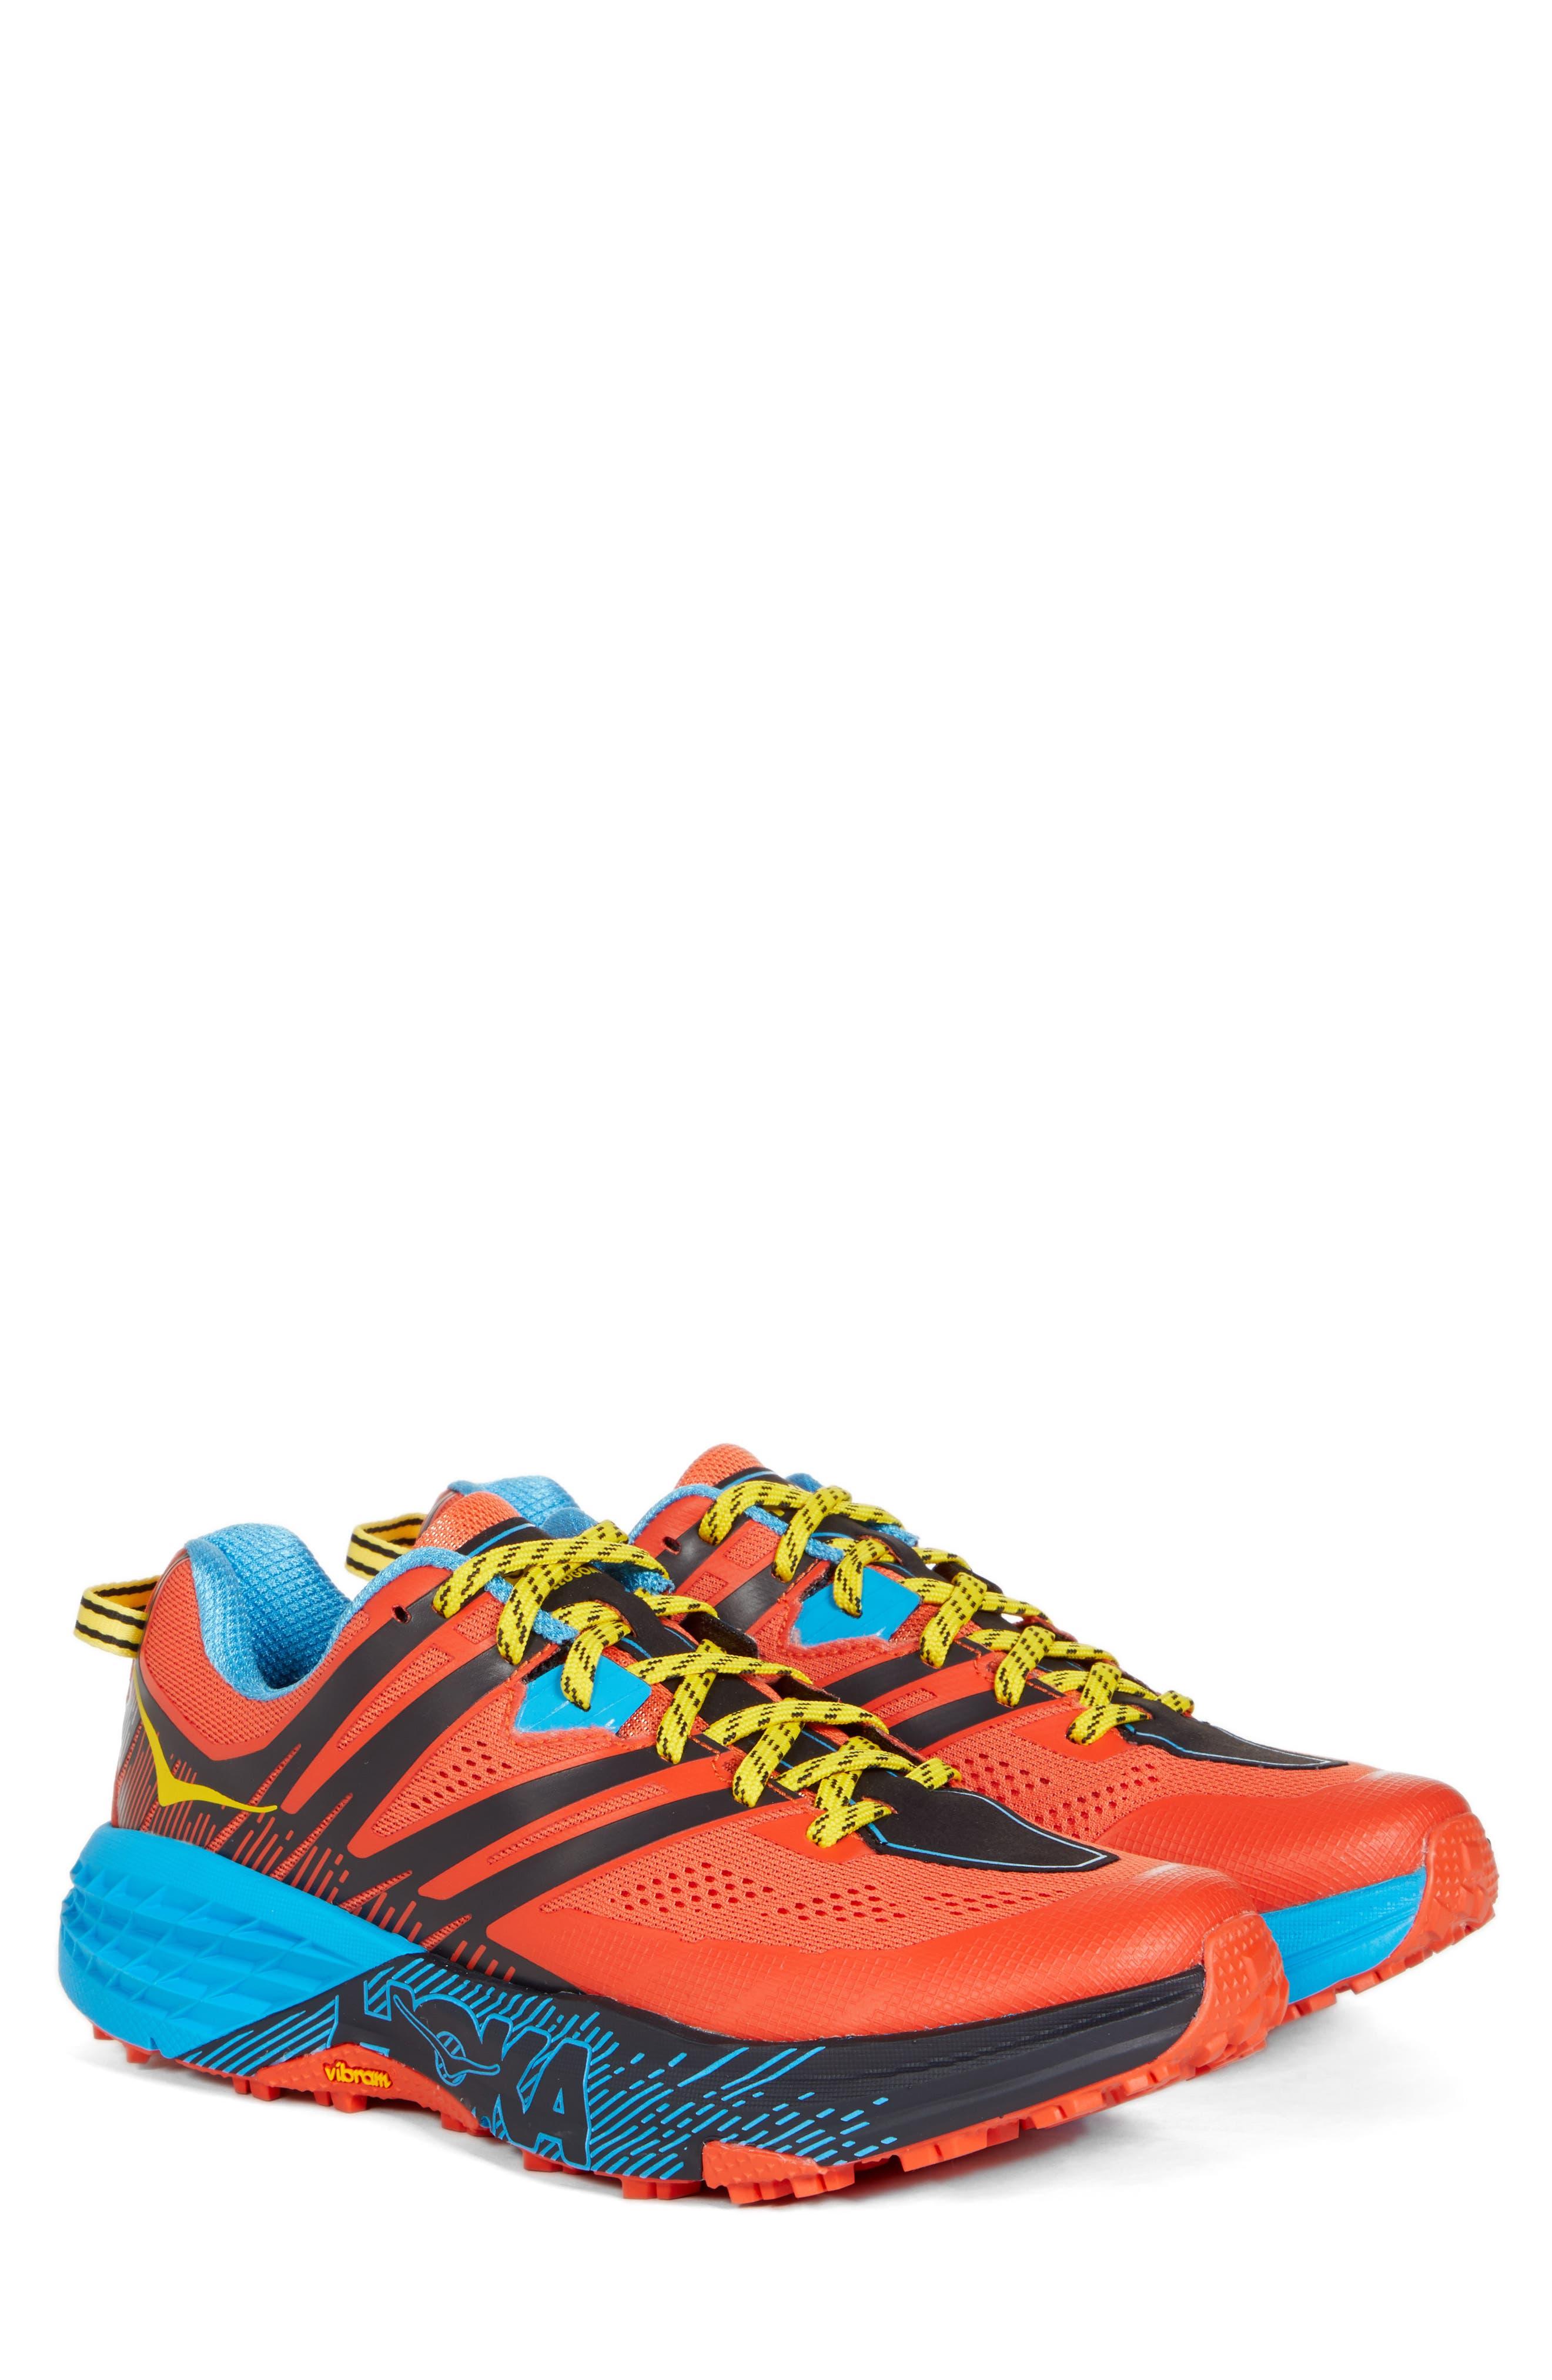 HOKA ONE ONE,  Speedgoat 3 Trail Running Shoe, Alternate thumbnail 2, color, 825